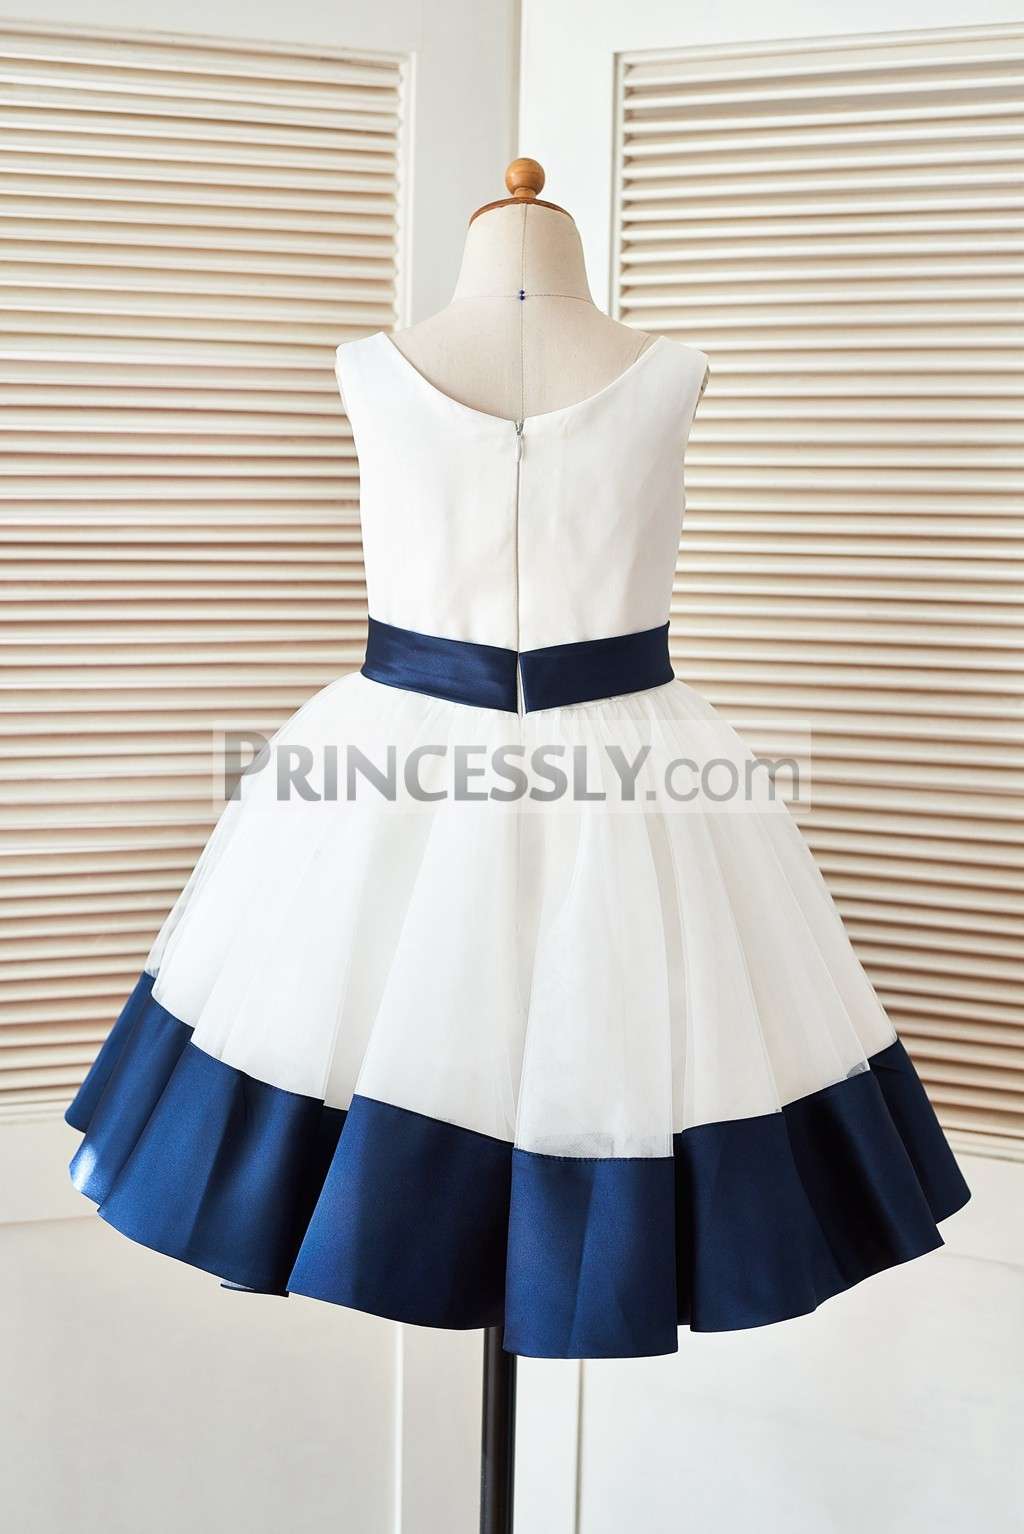 f8f741c59502 Ivory Satin Tulle Flower Girl Dress with Navy Blue Belt Bow & Hem ...